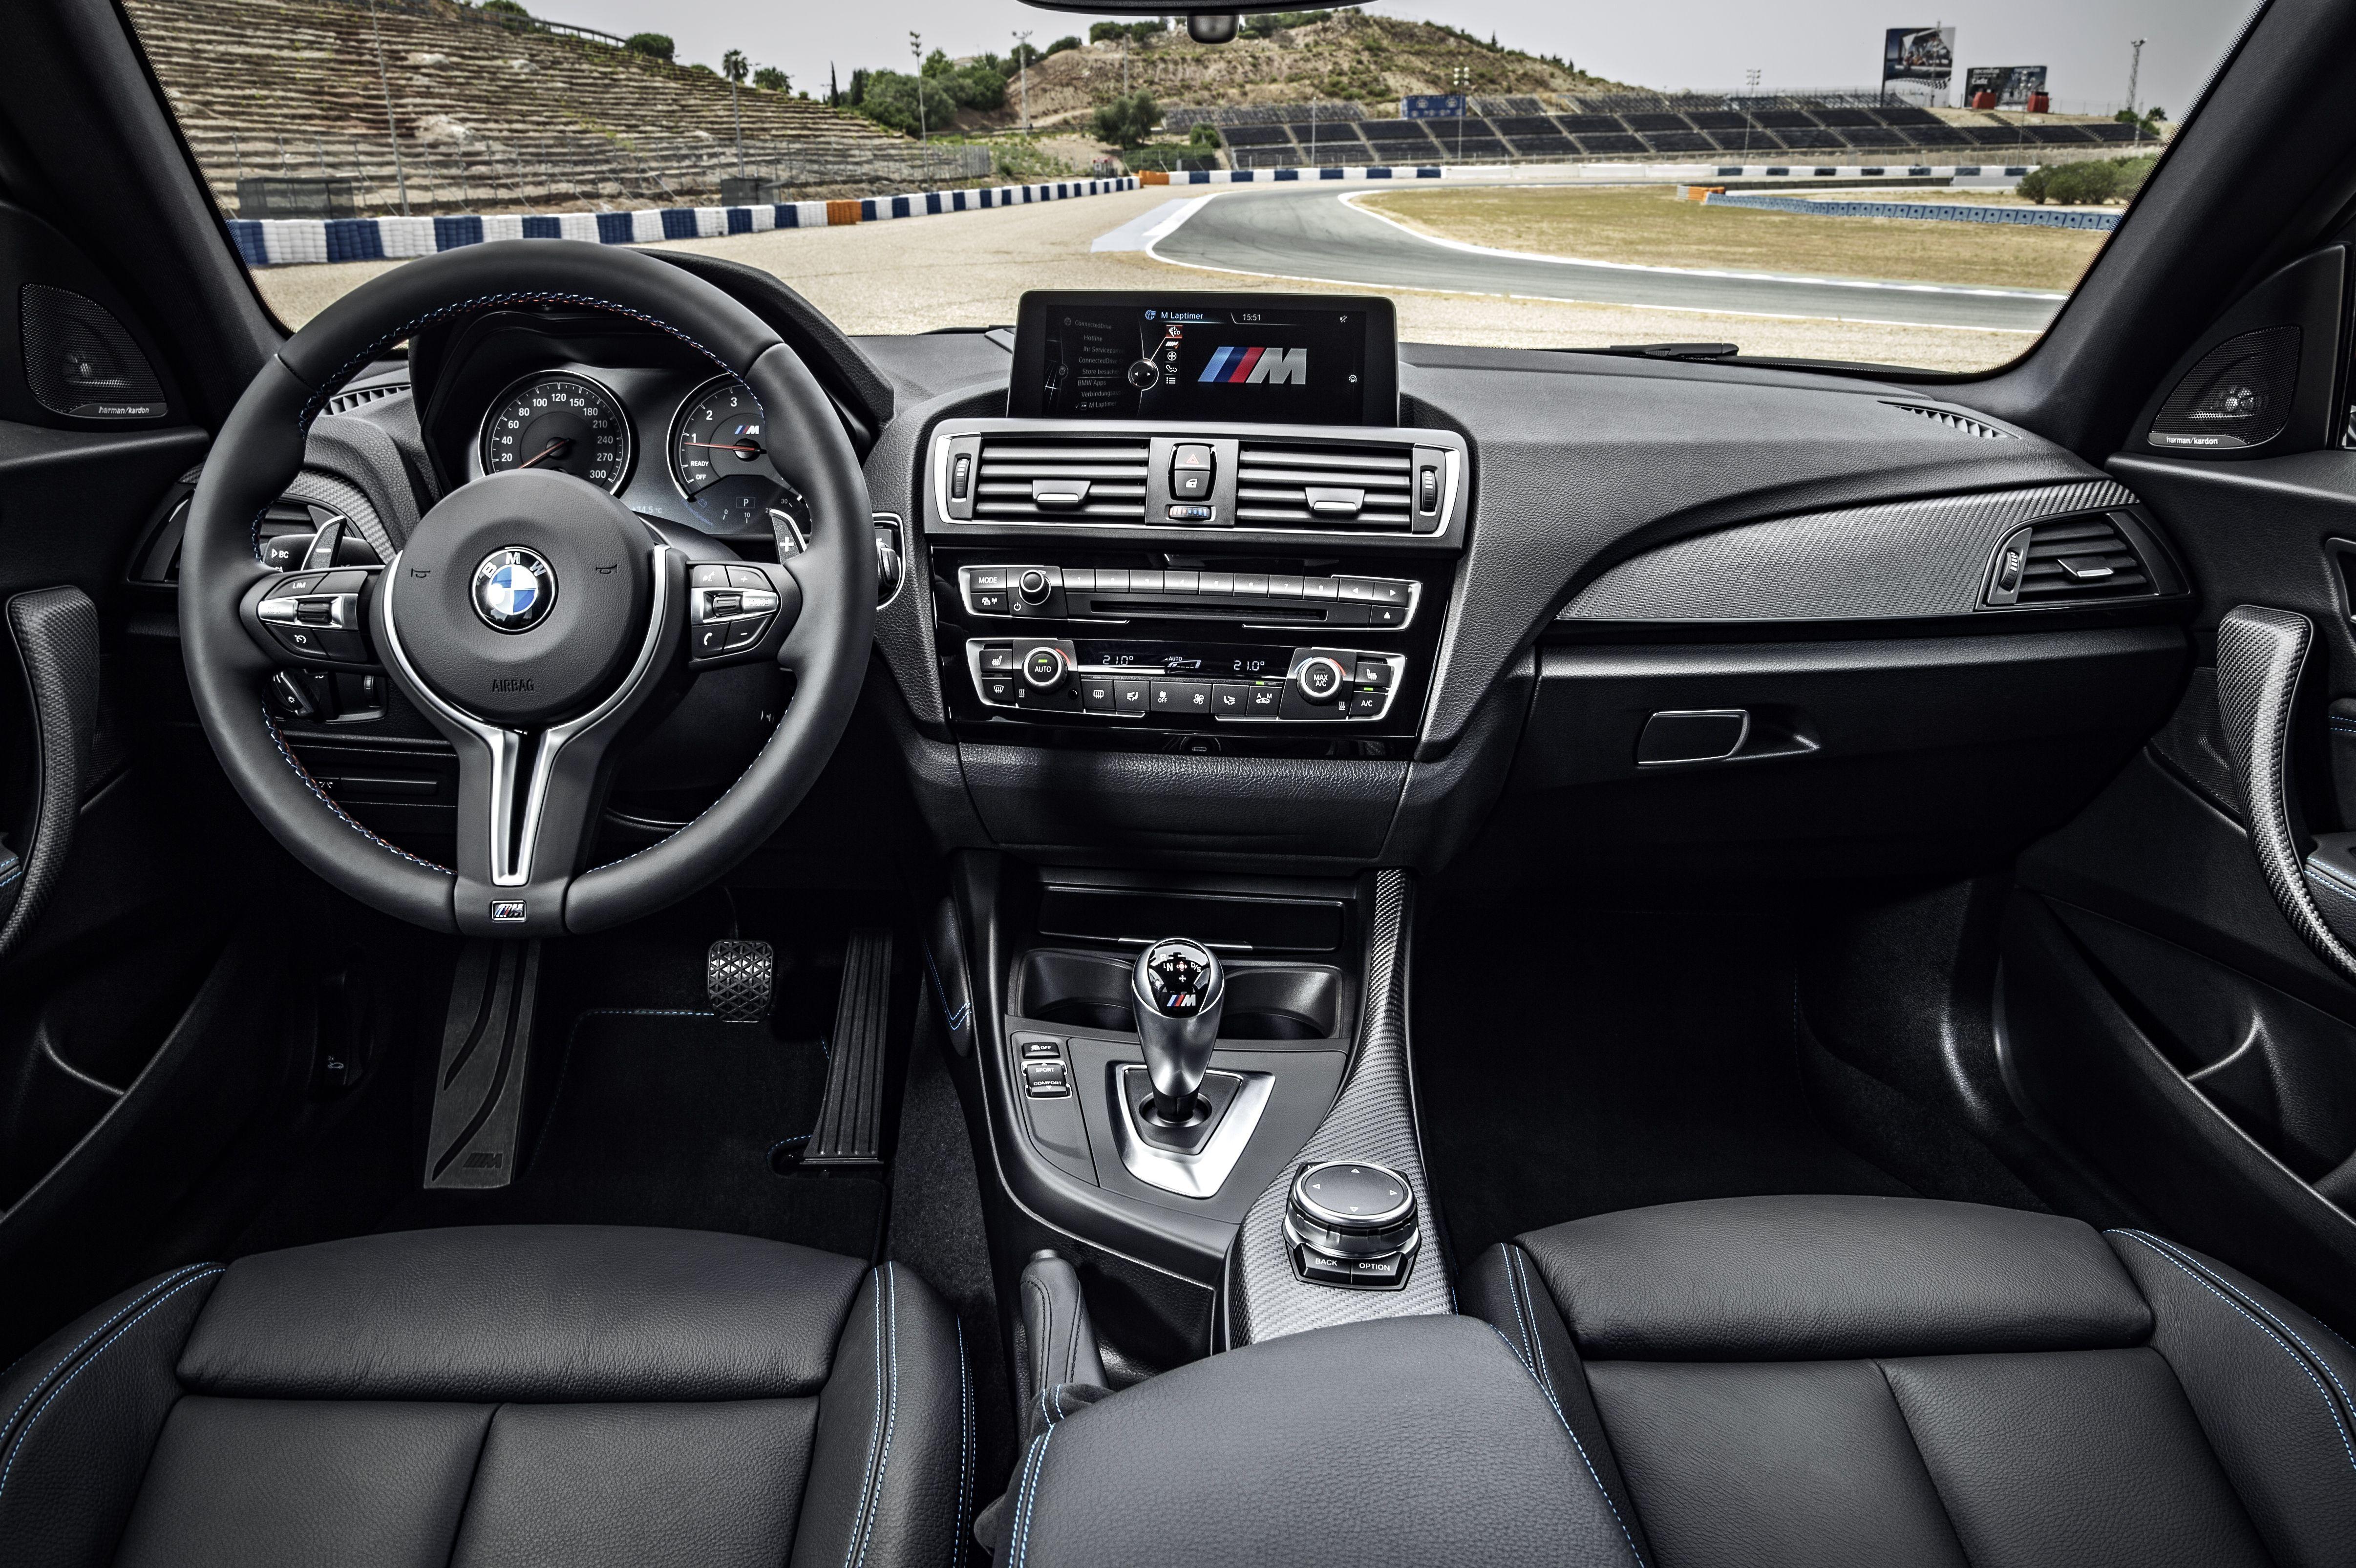 Bmw f87 m2 coupe interior design